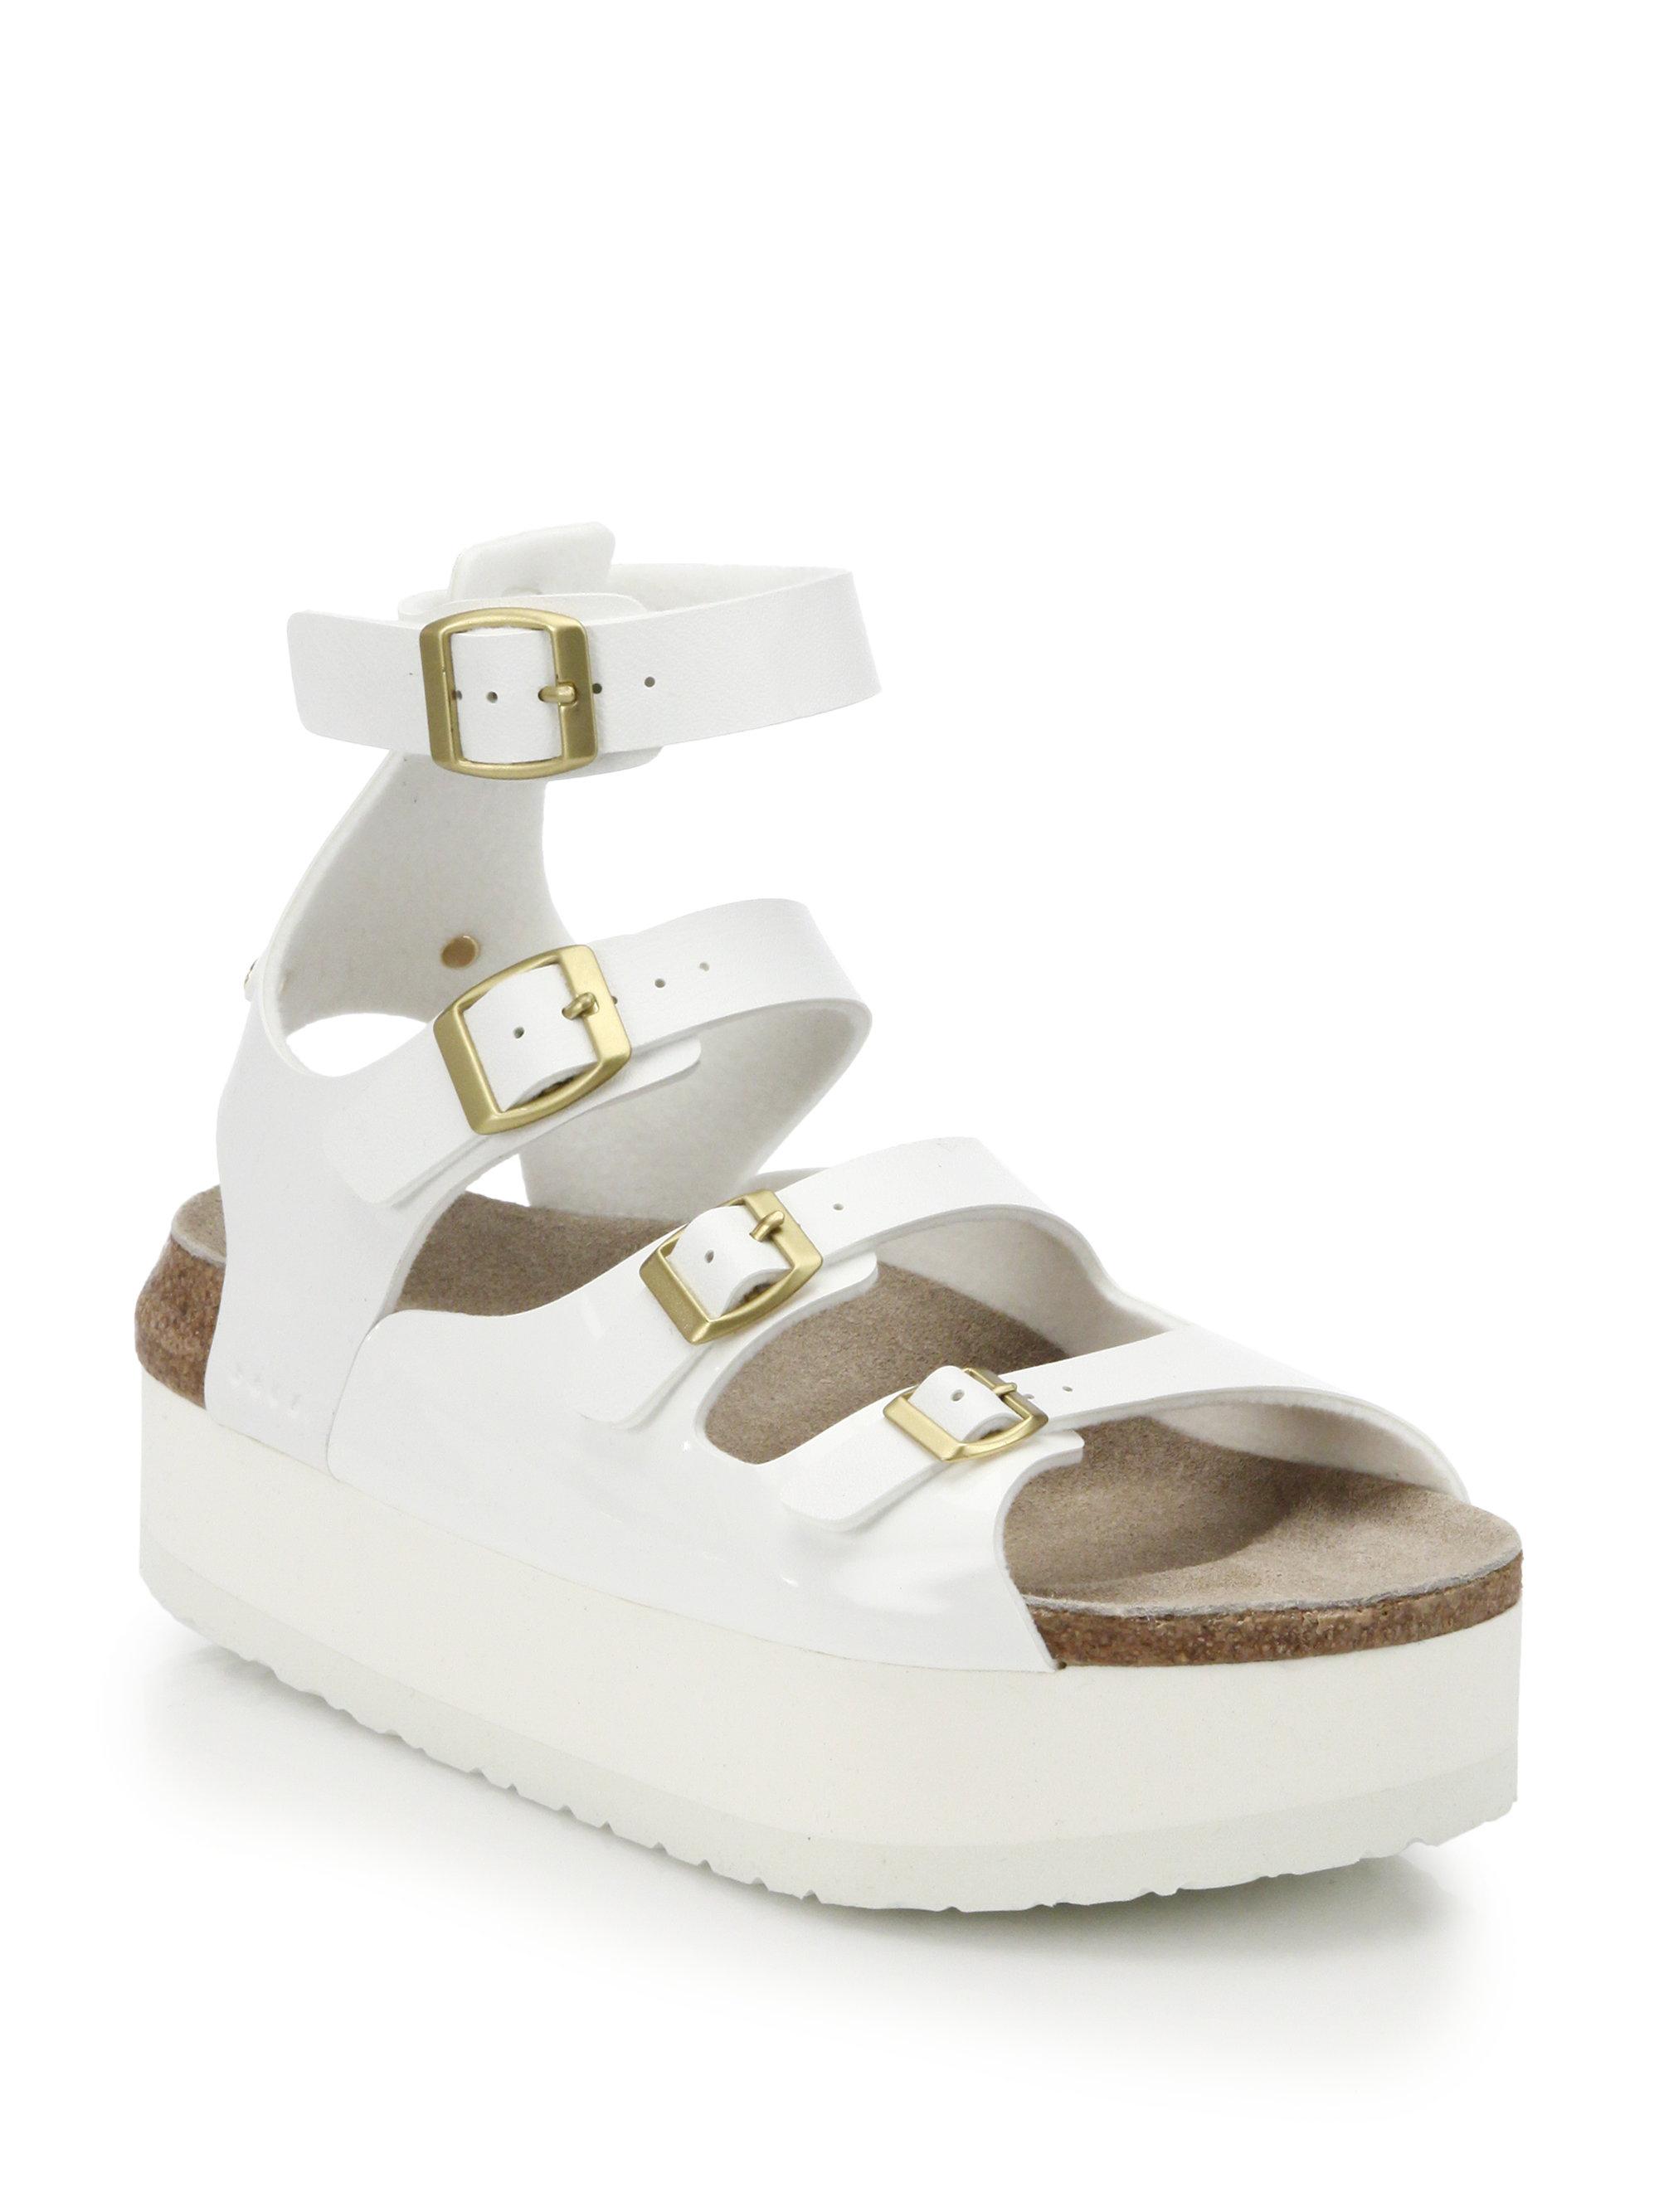 dfdfa8fa856 Lyst - Sacai Multi-Strap Leather Platform Sandals in White